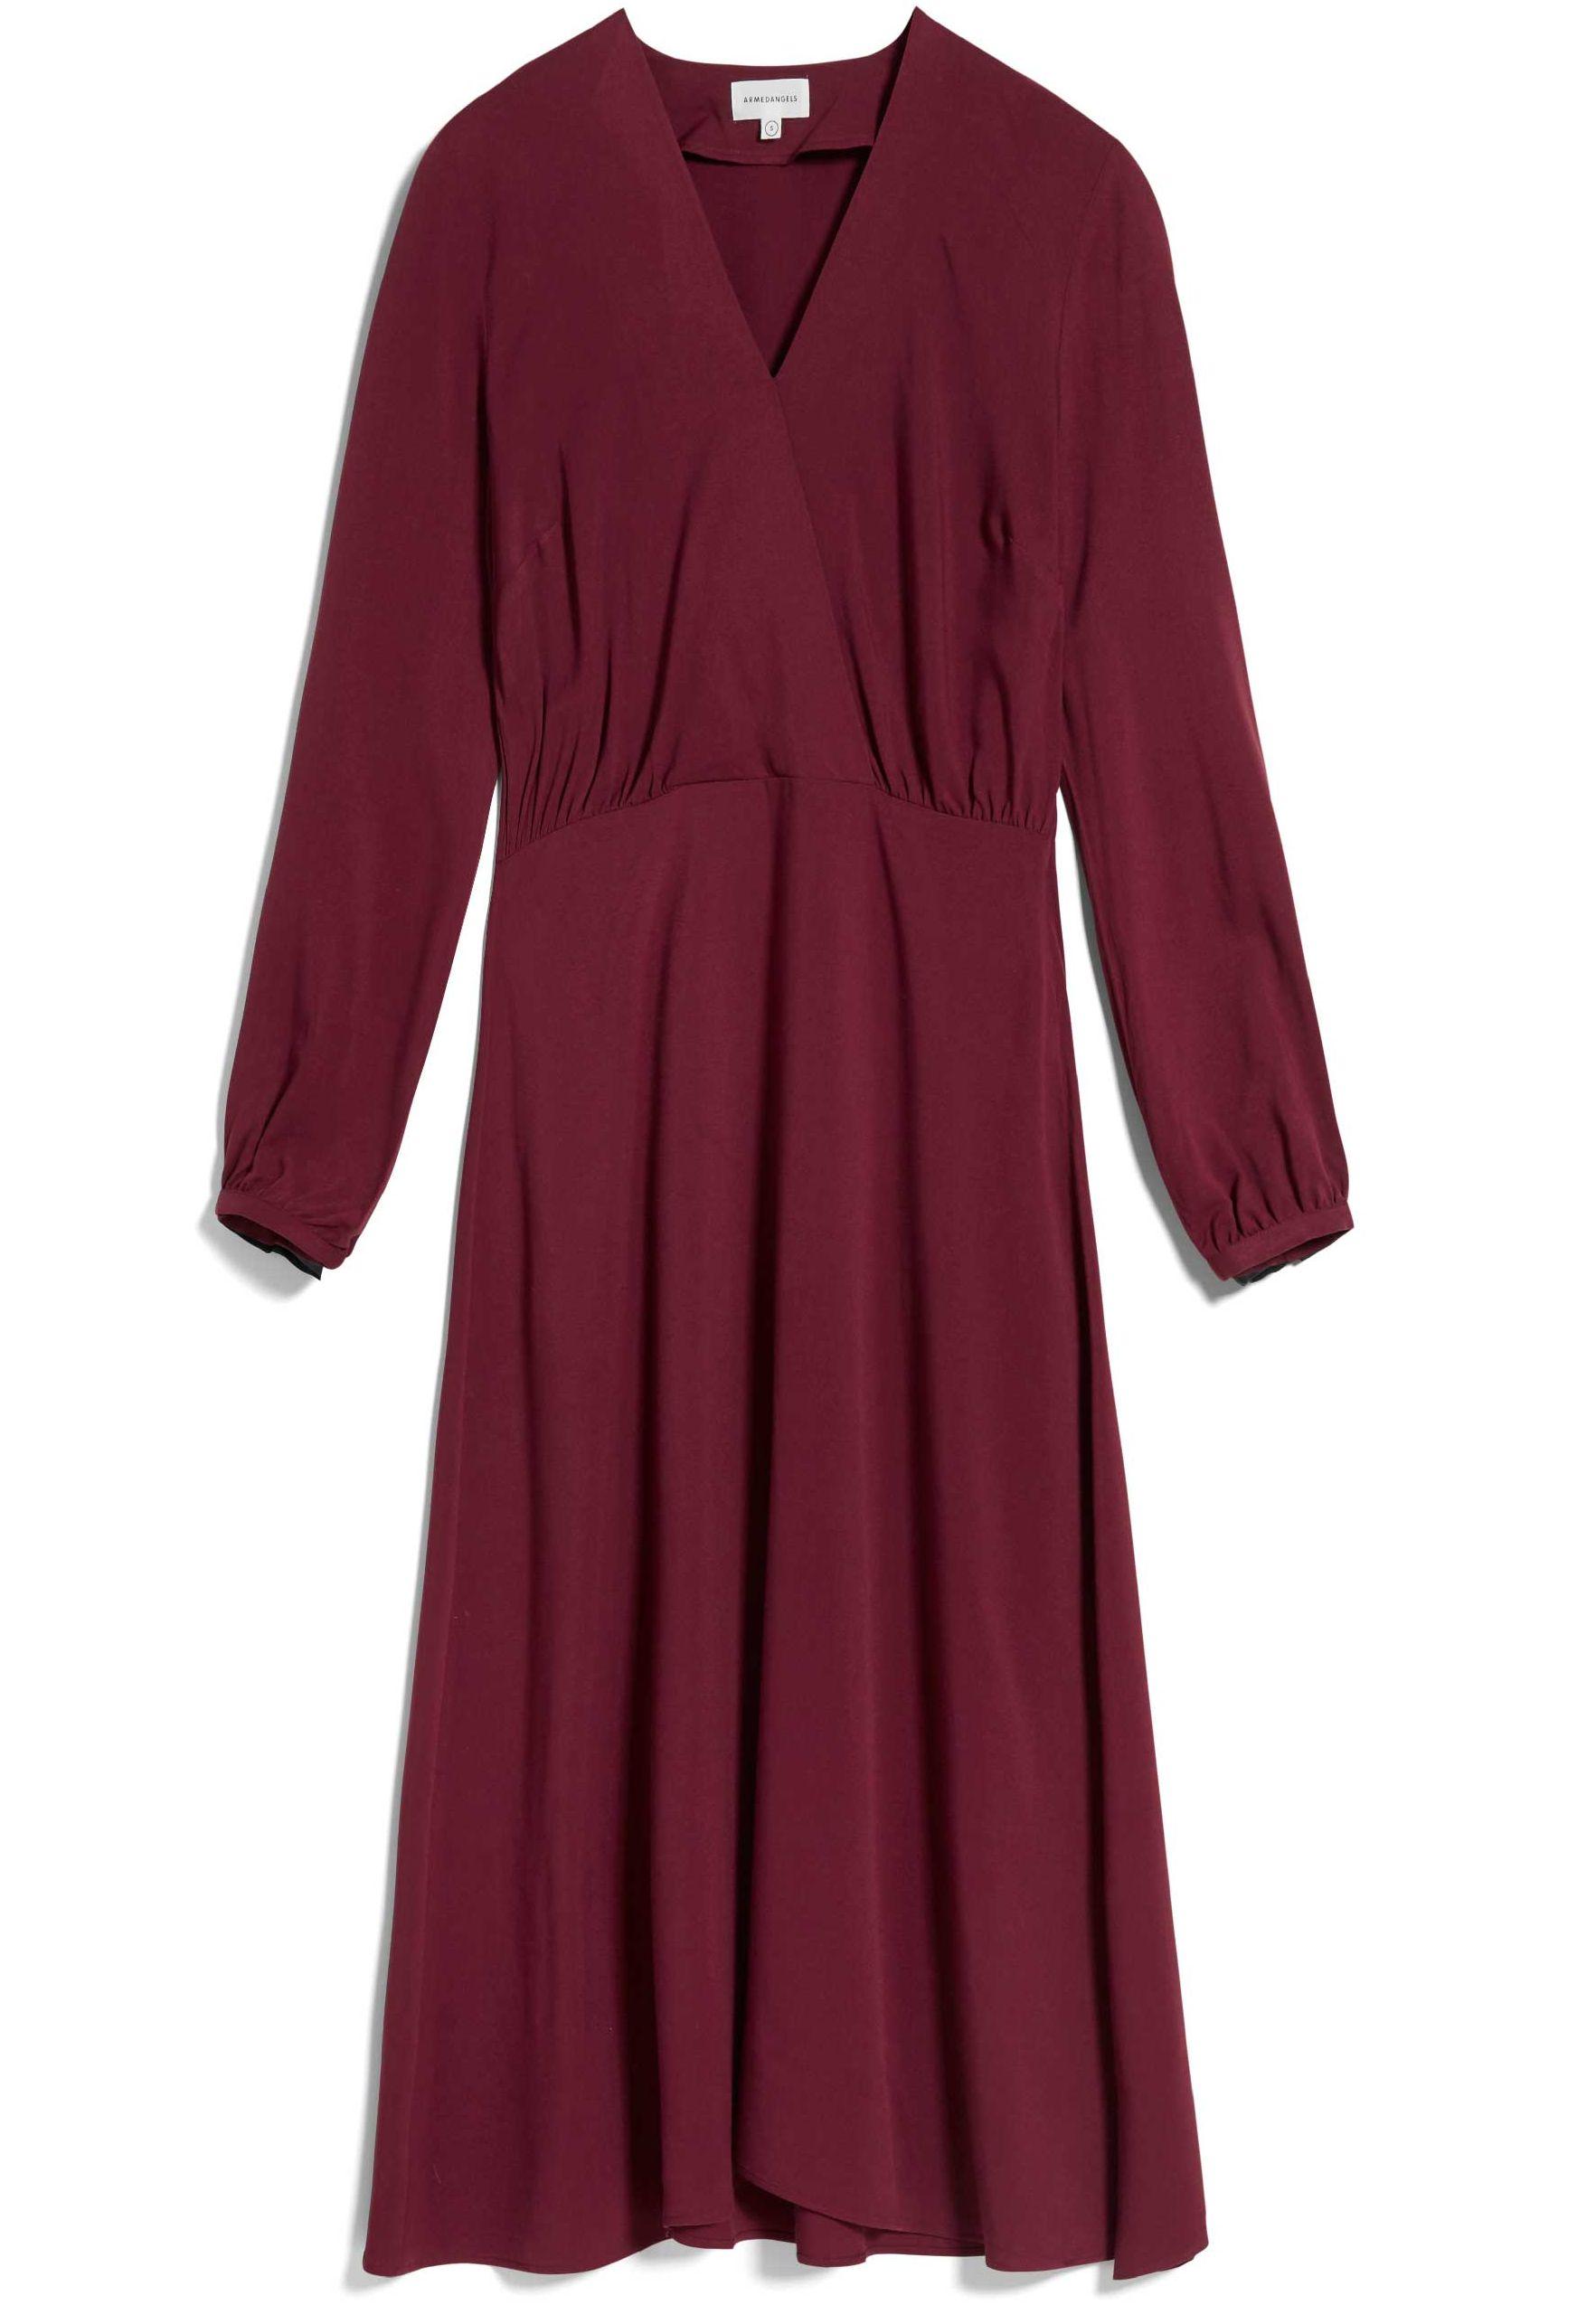 Damen-Kleid ALEIXAA ruby red